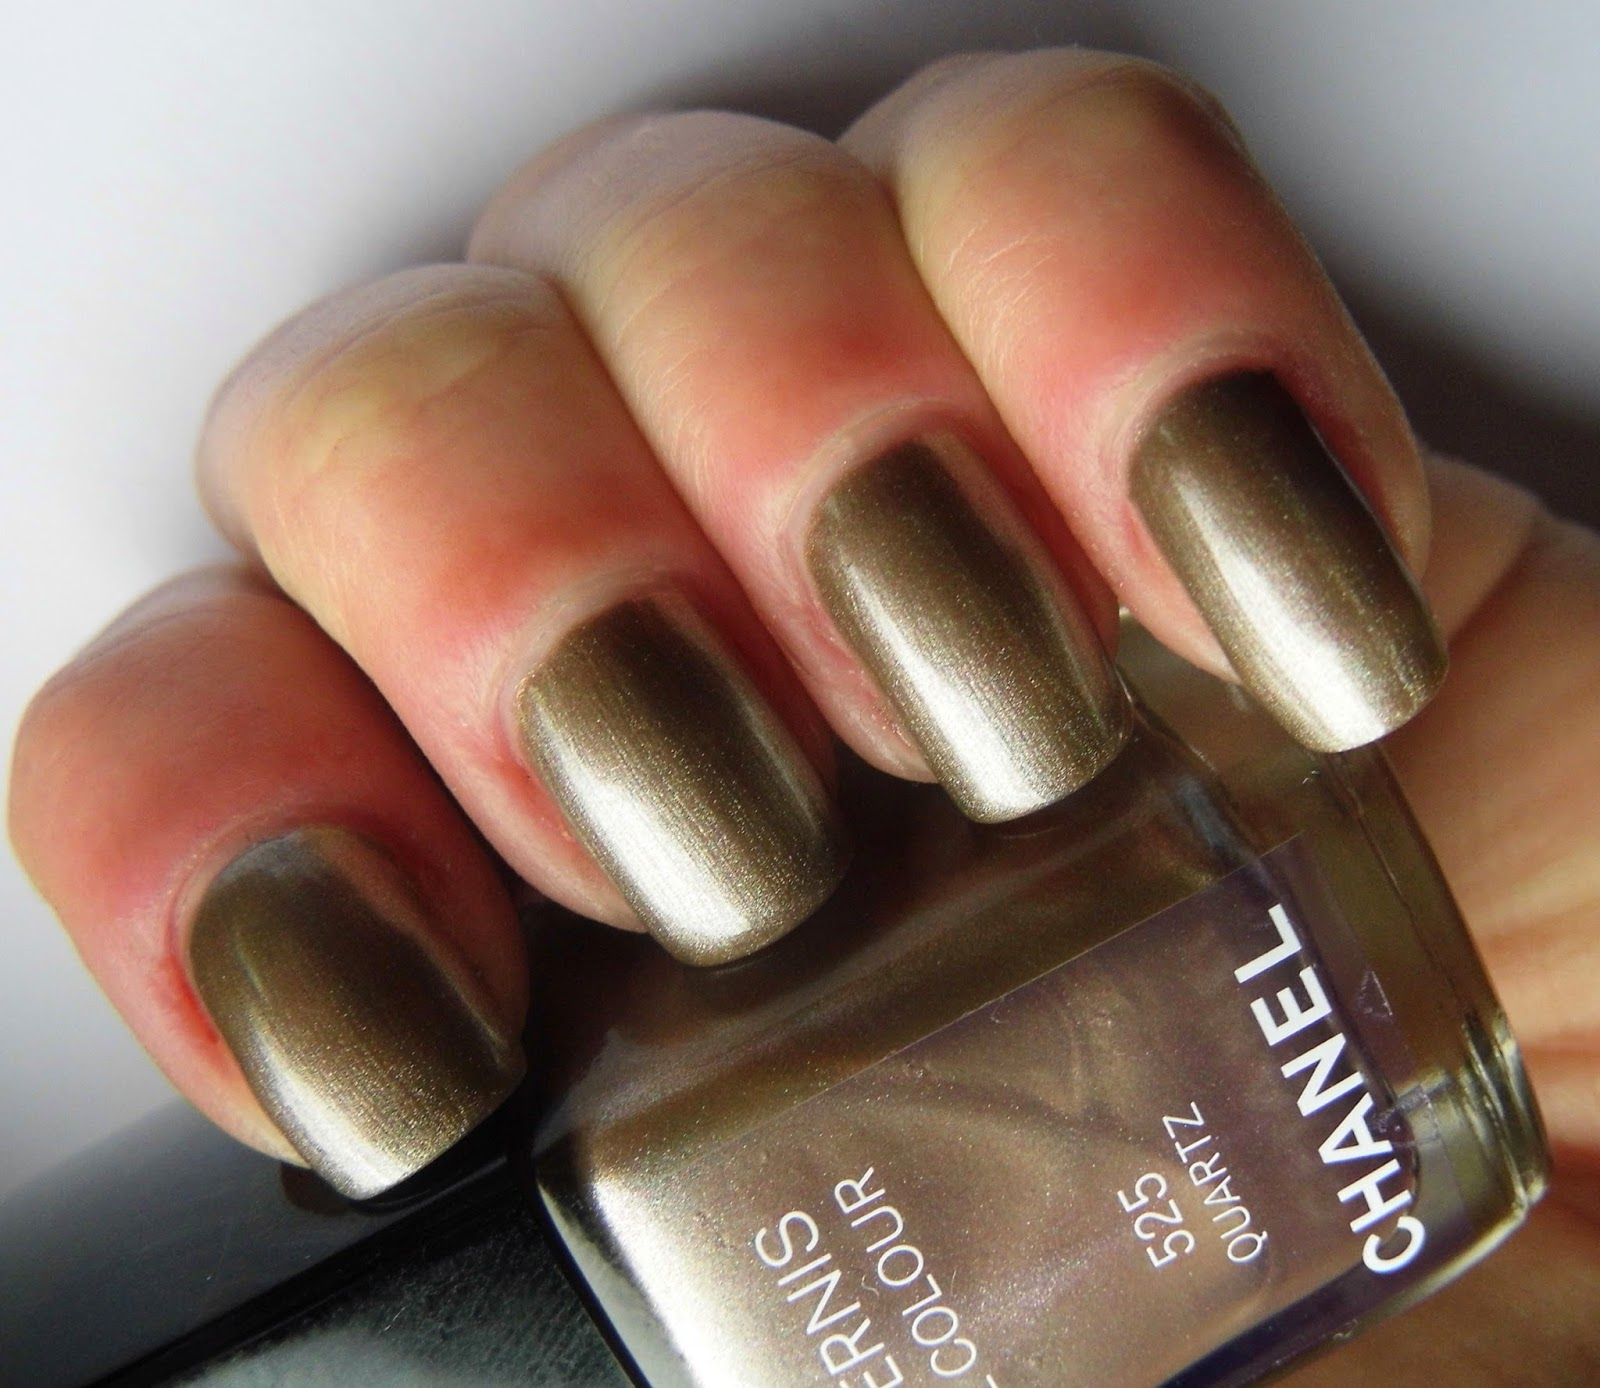 chanel-quartz-nail-polish-swatch-picture